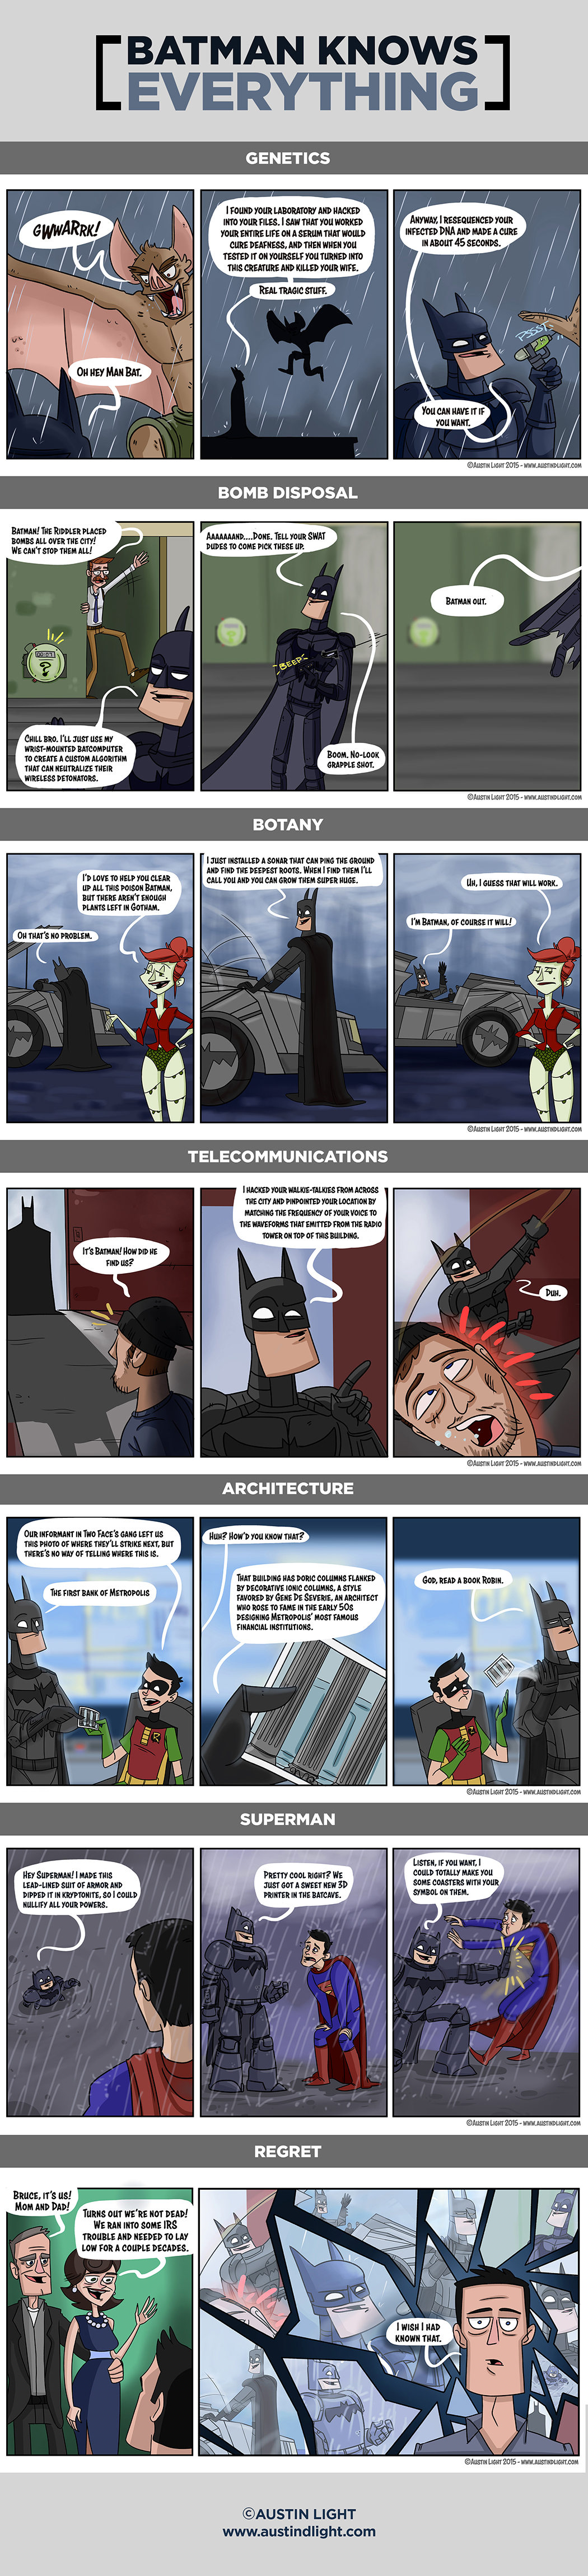 Batman Knows Everything.jpg